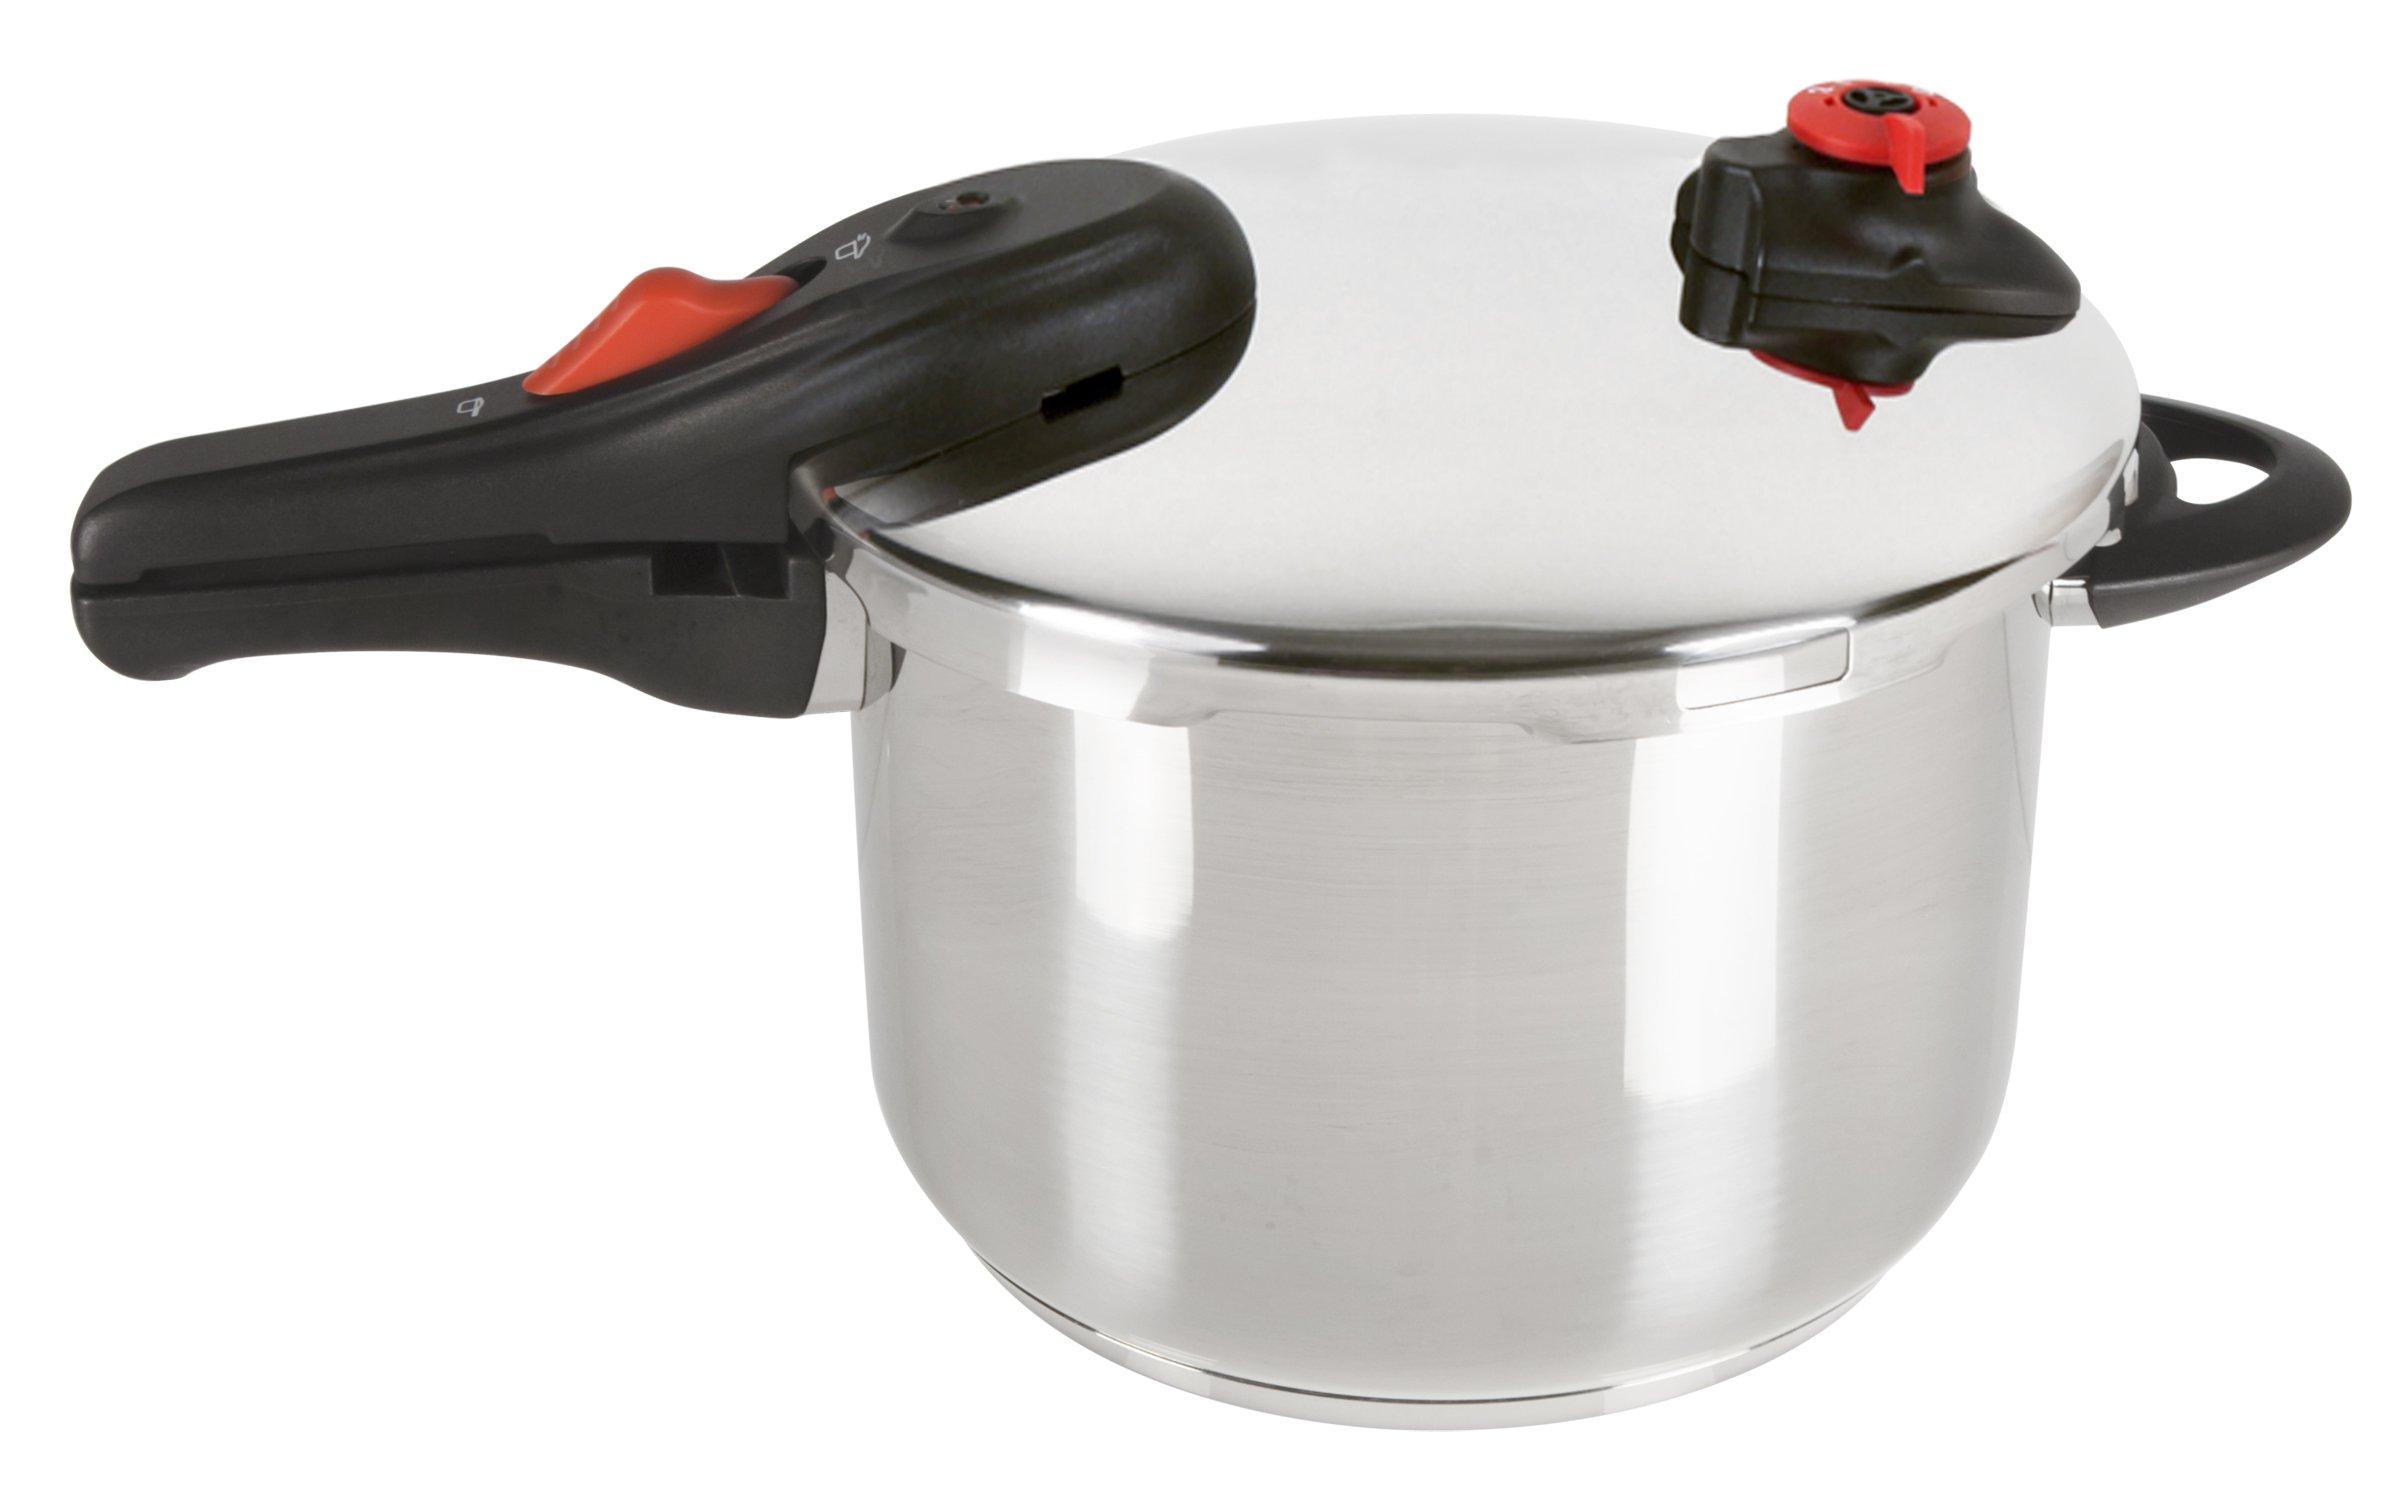 NuWave 31201 stainless steel pressure cooker, 6.5 Quart, Silver by NuWave